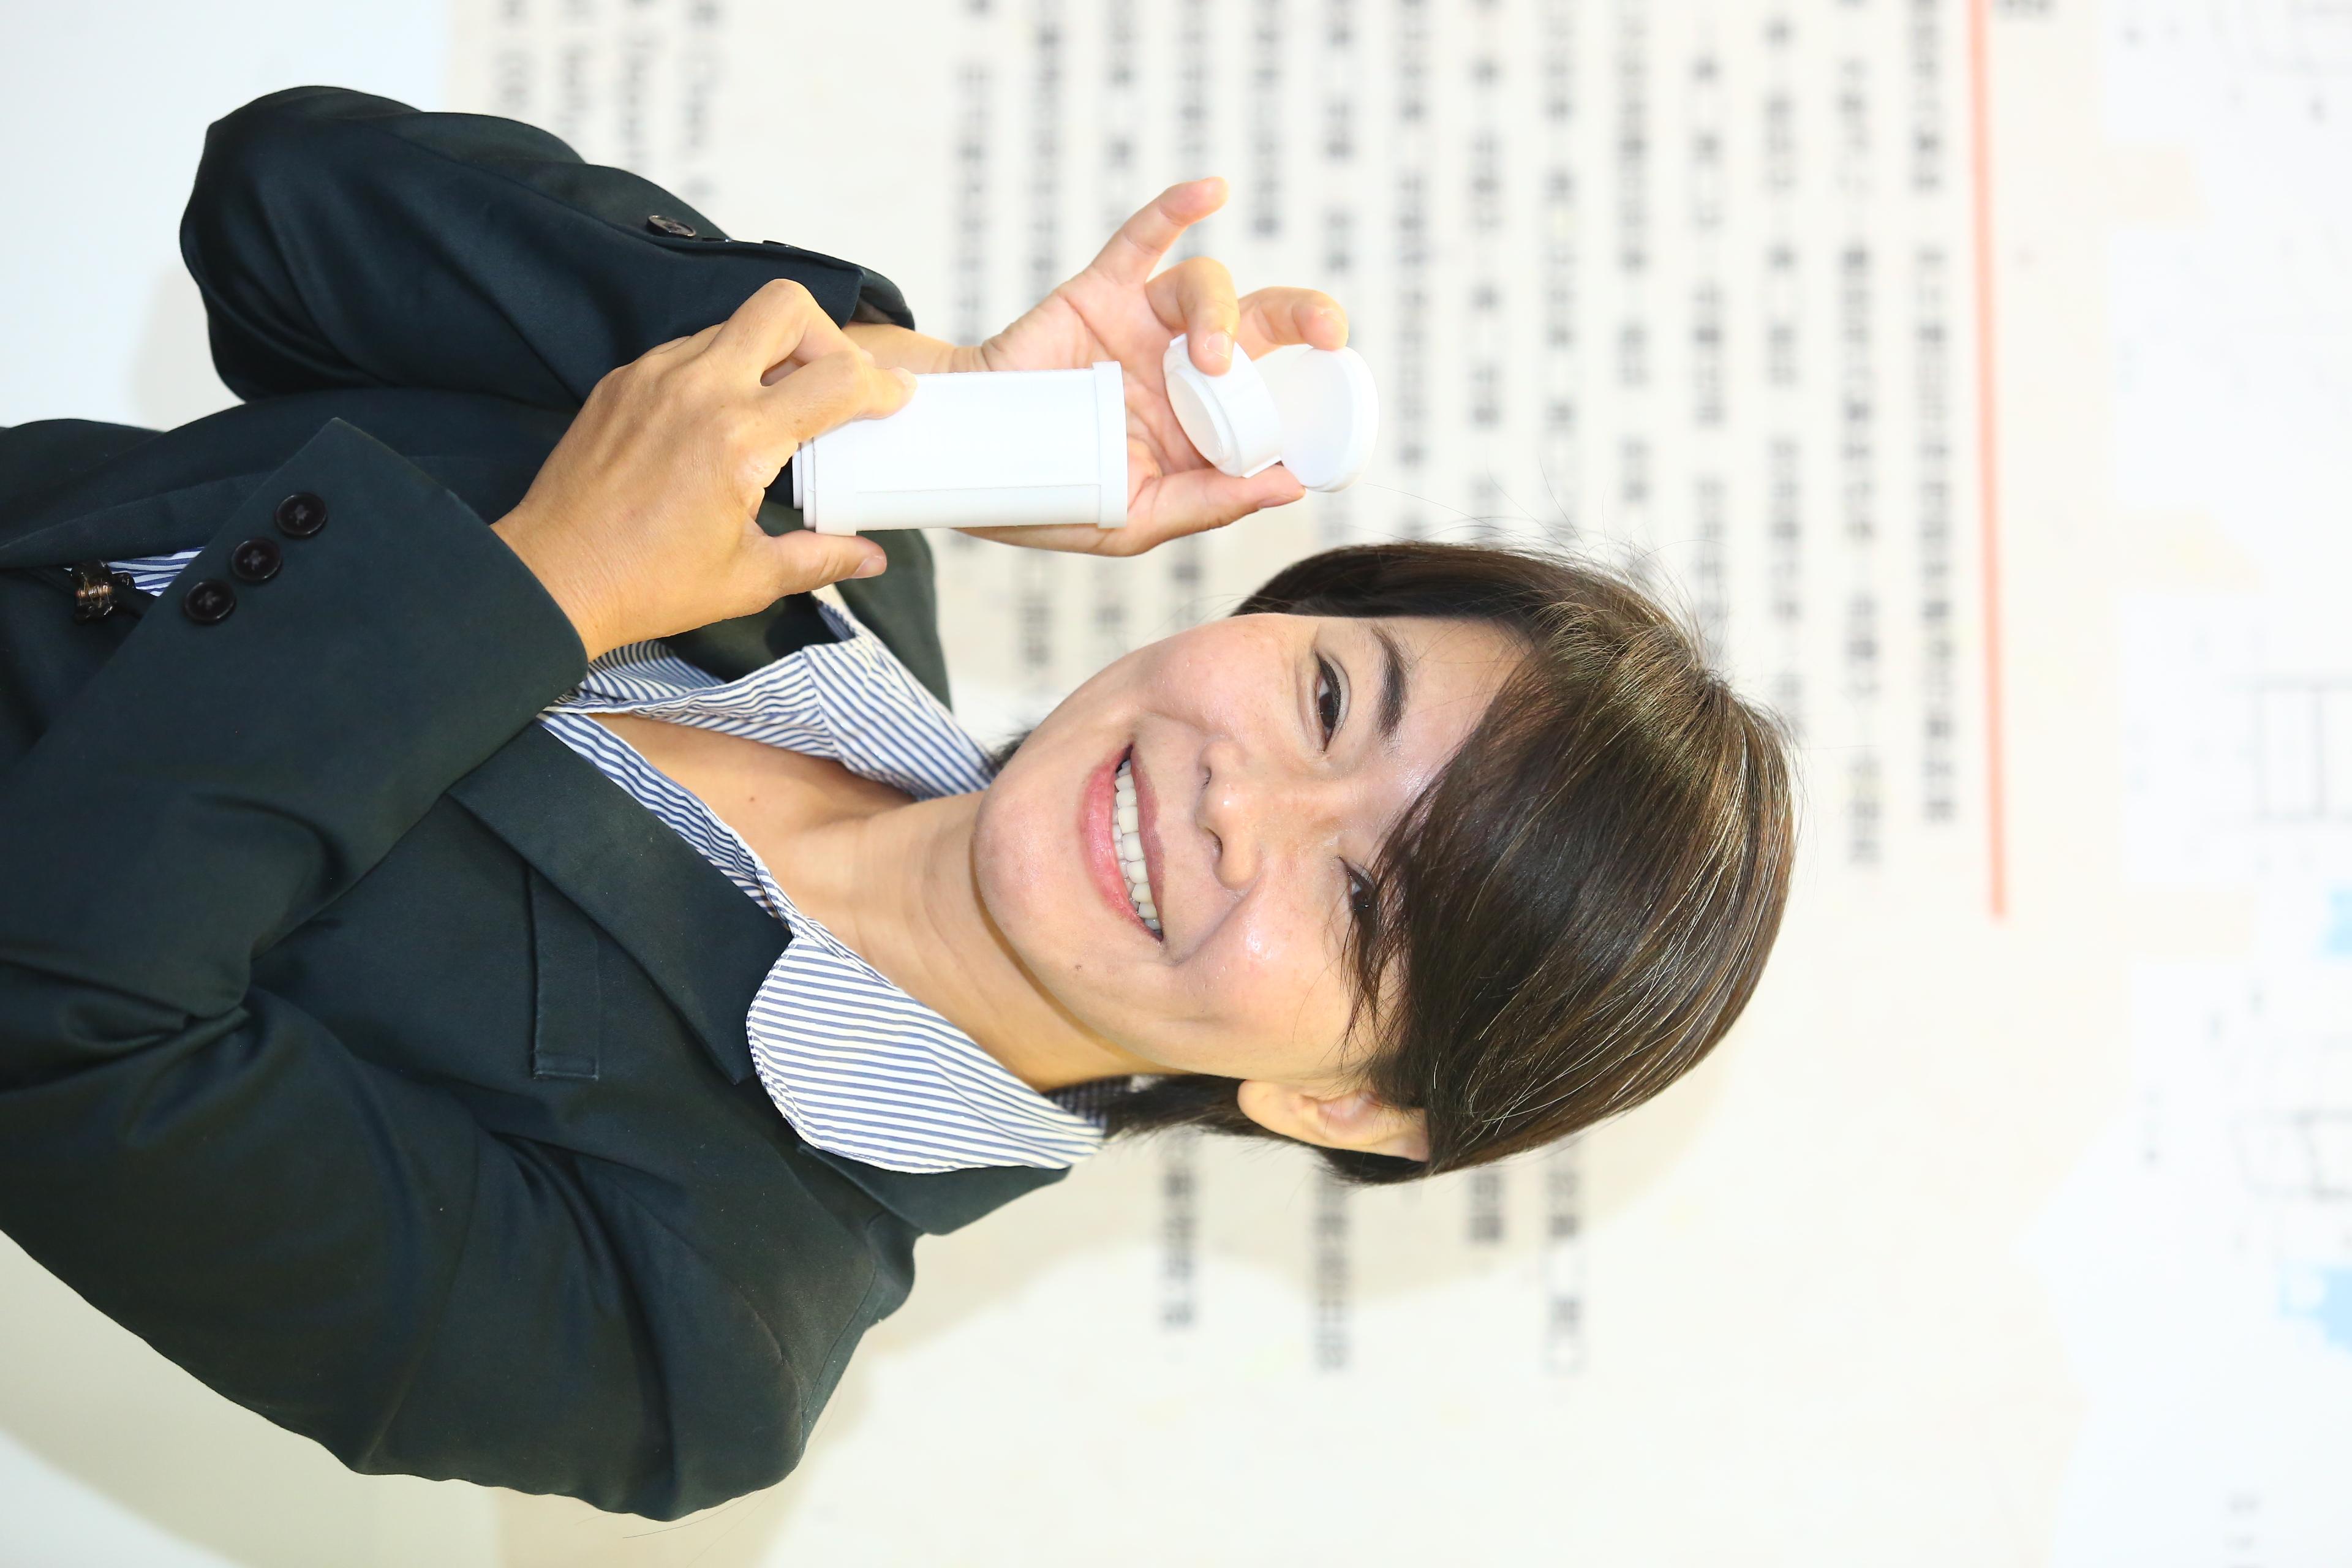 https://storage.googleapis.com/www.taiwantradeshow.com.tw/activity-photo/202009/T-07527250-name.jpg